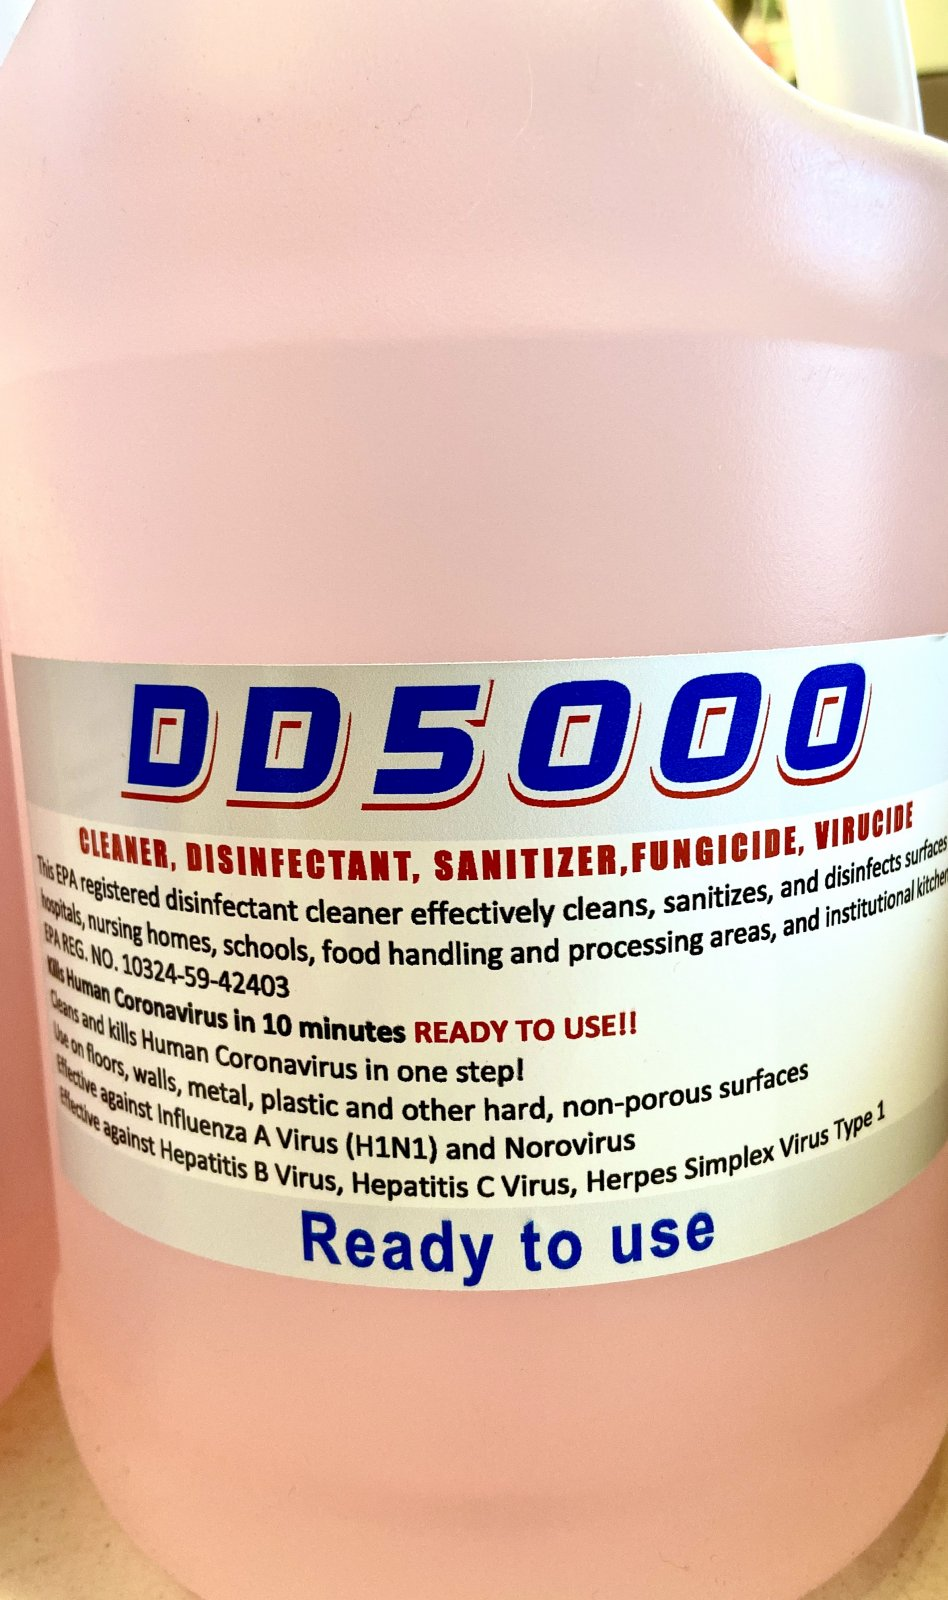 DD5000